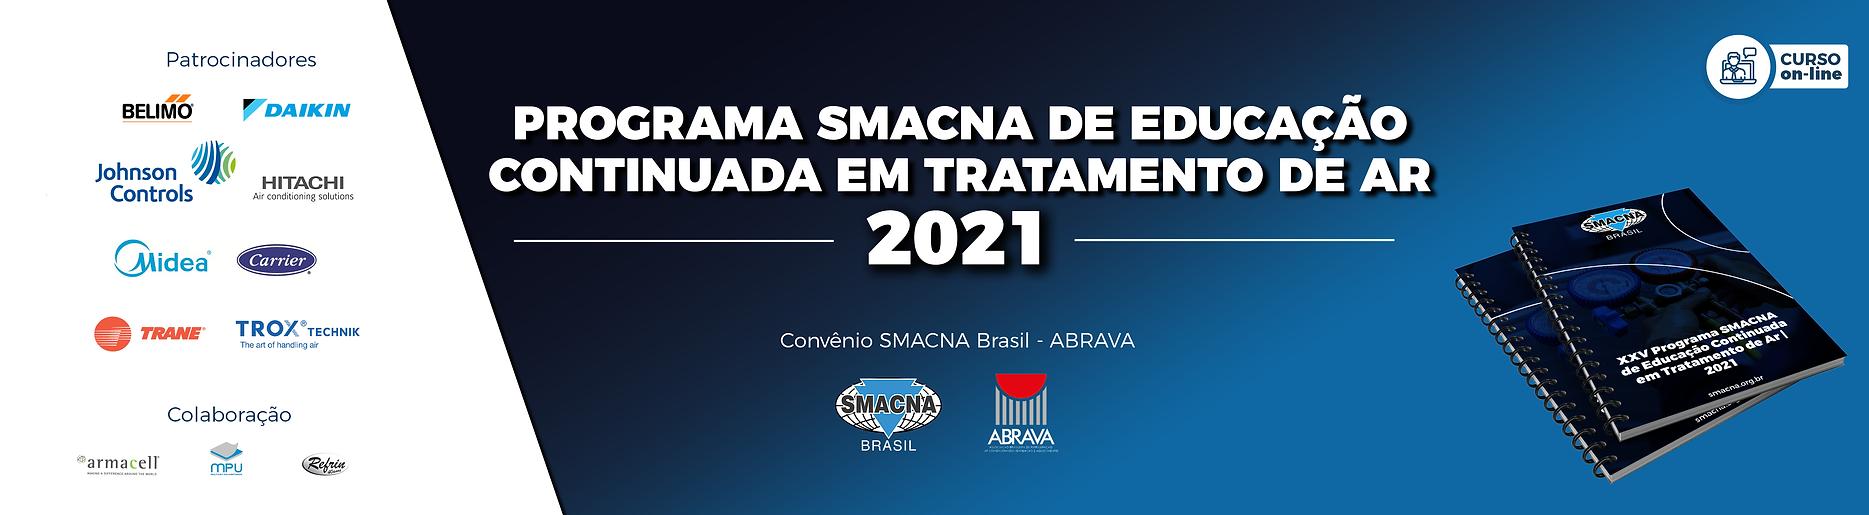 smacna-curso-banner-site-6.png